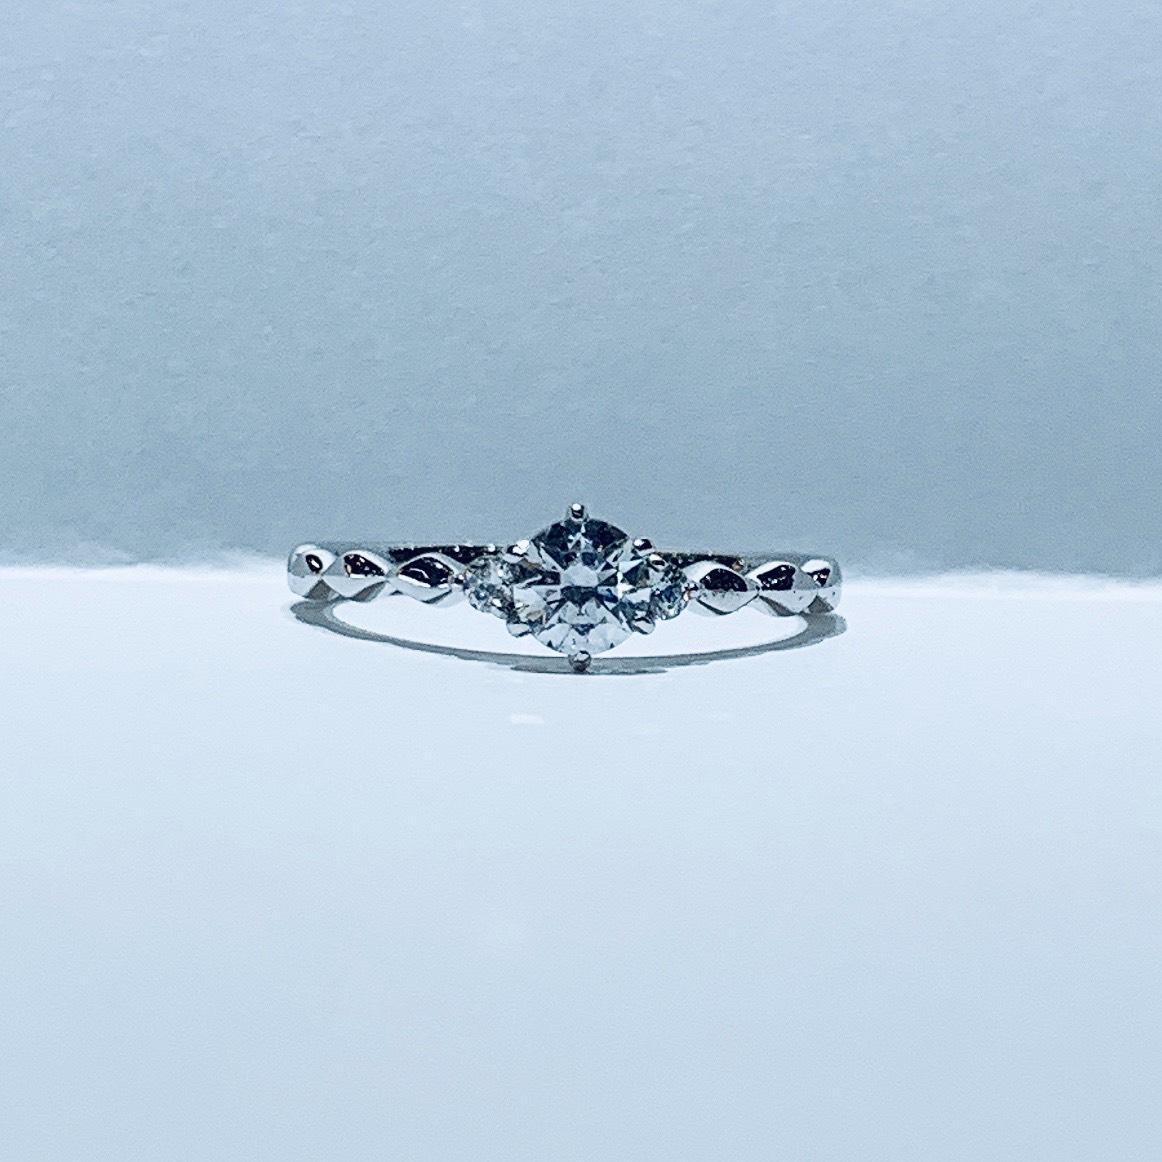 BROOCH 婚約指輪 エンゲージリング シンプルキュートデザイン